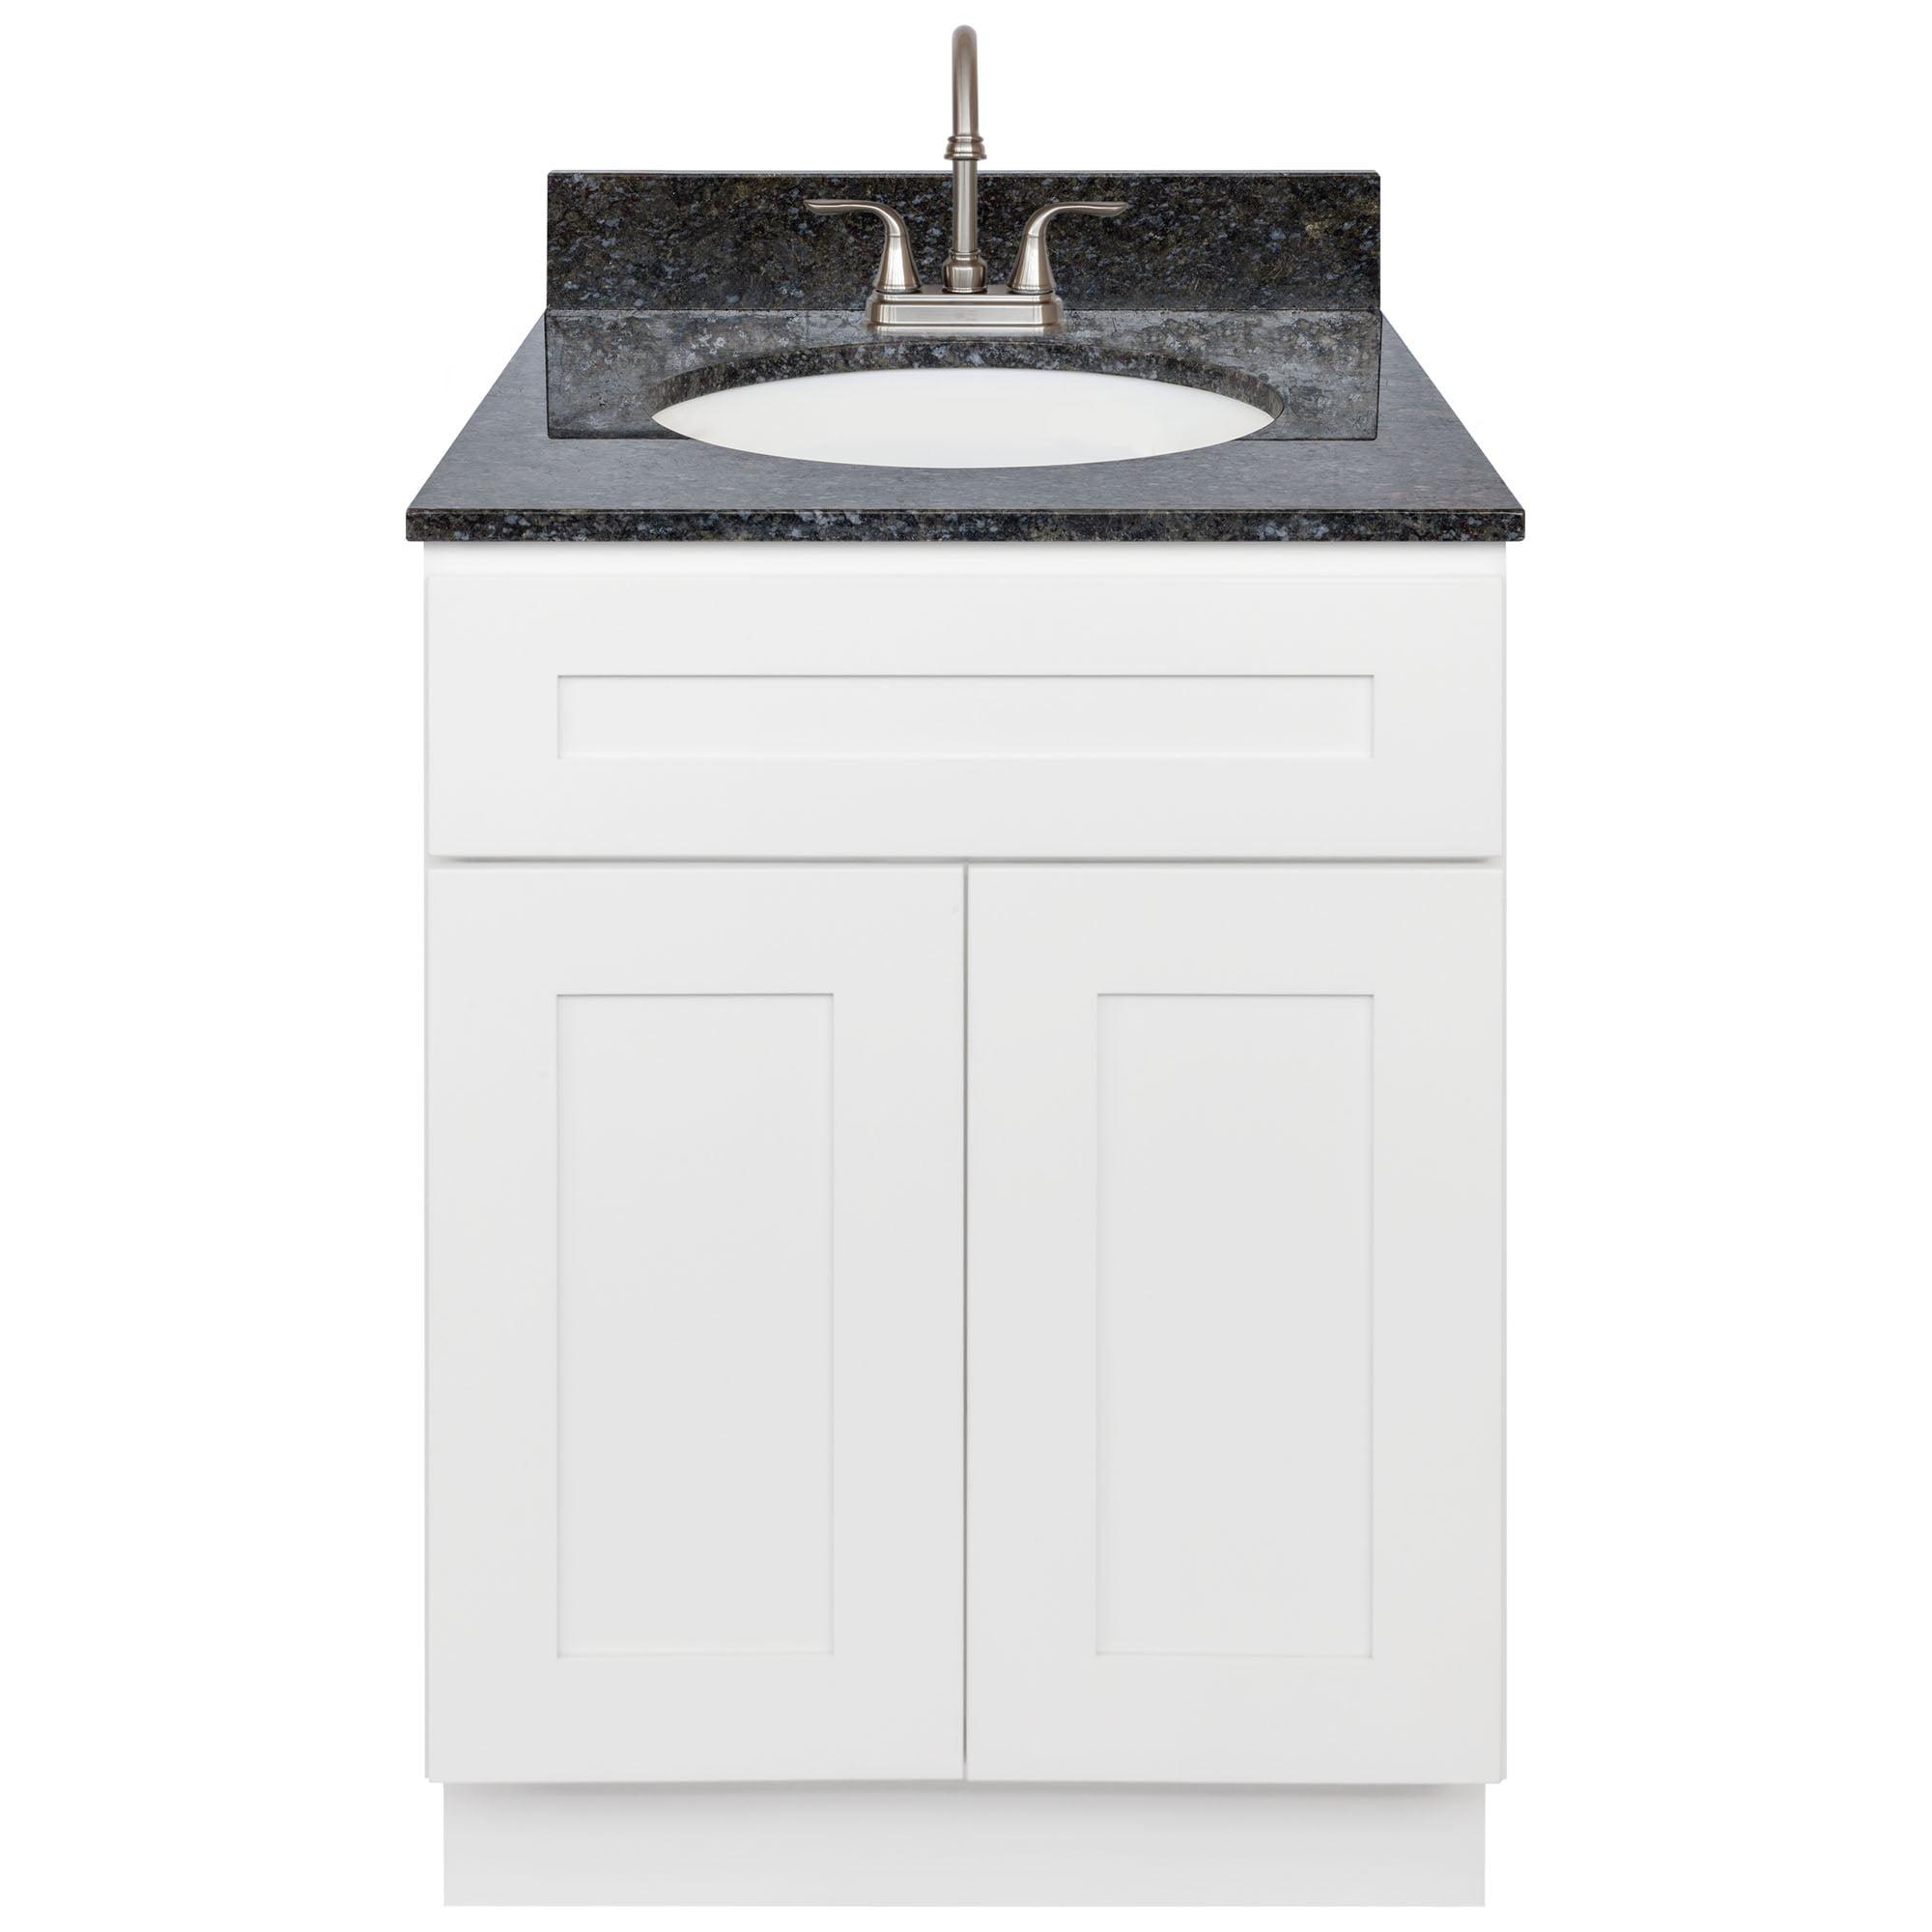 White Bathroom Vanity 24 Blue Butterfly Granite Top Faucet Lb6b Walmart Com Walmart Com